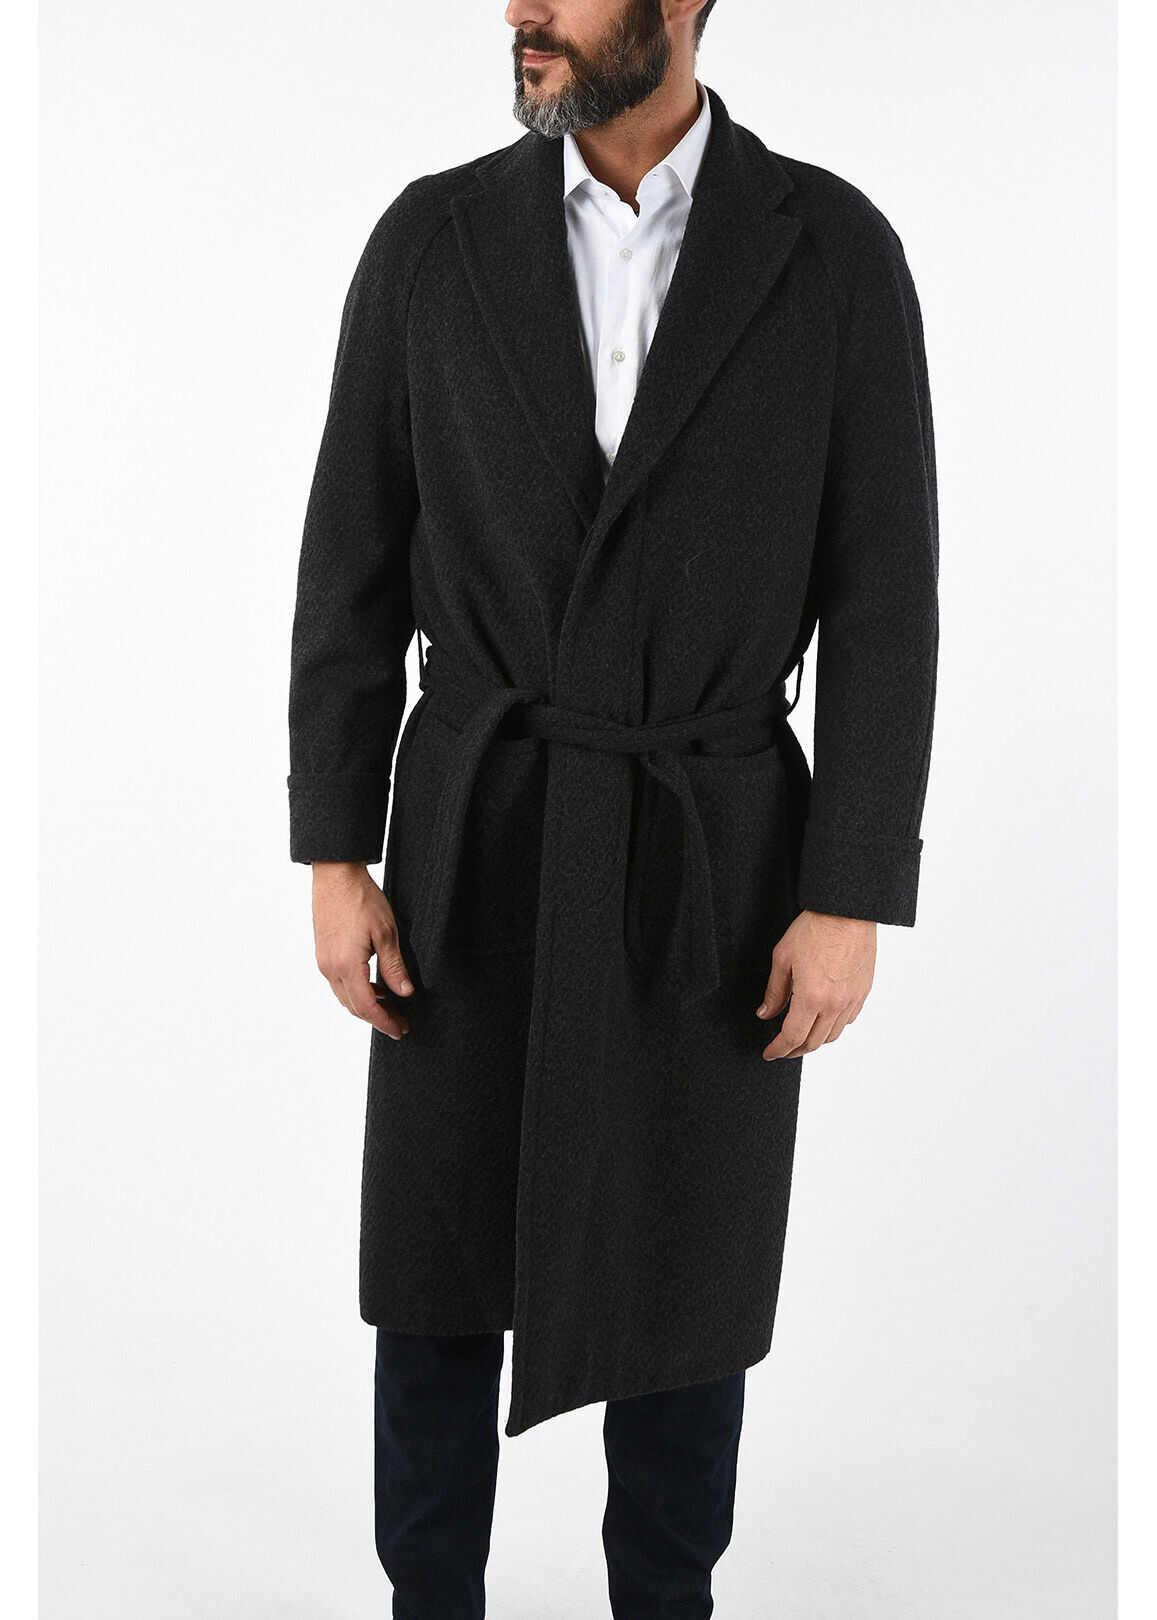 CORNELIANI cashmere and virgin wool single breasted trench GRAY imagine